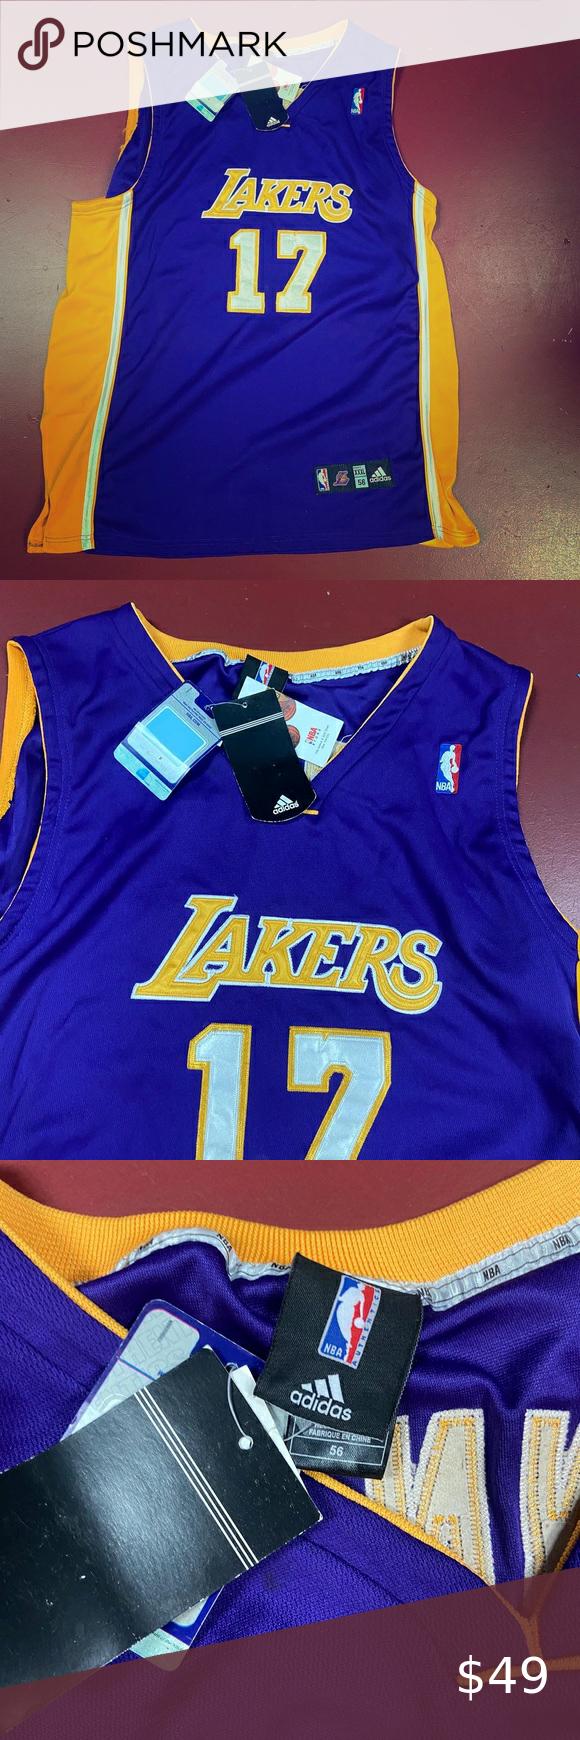 La Fabrique A Jersey : fabrique, jersey, Adidas, Lakers, Bynum, Jersey, Number, Clothes, Design,, Shirt,, Fashion, Design